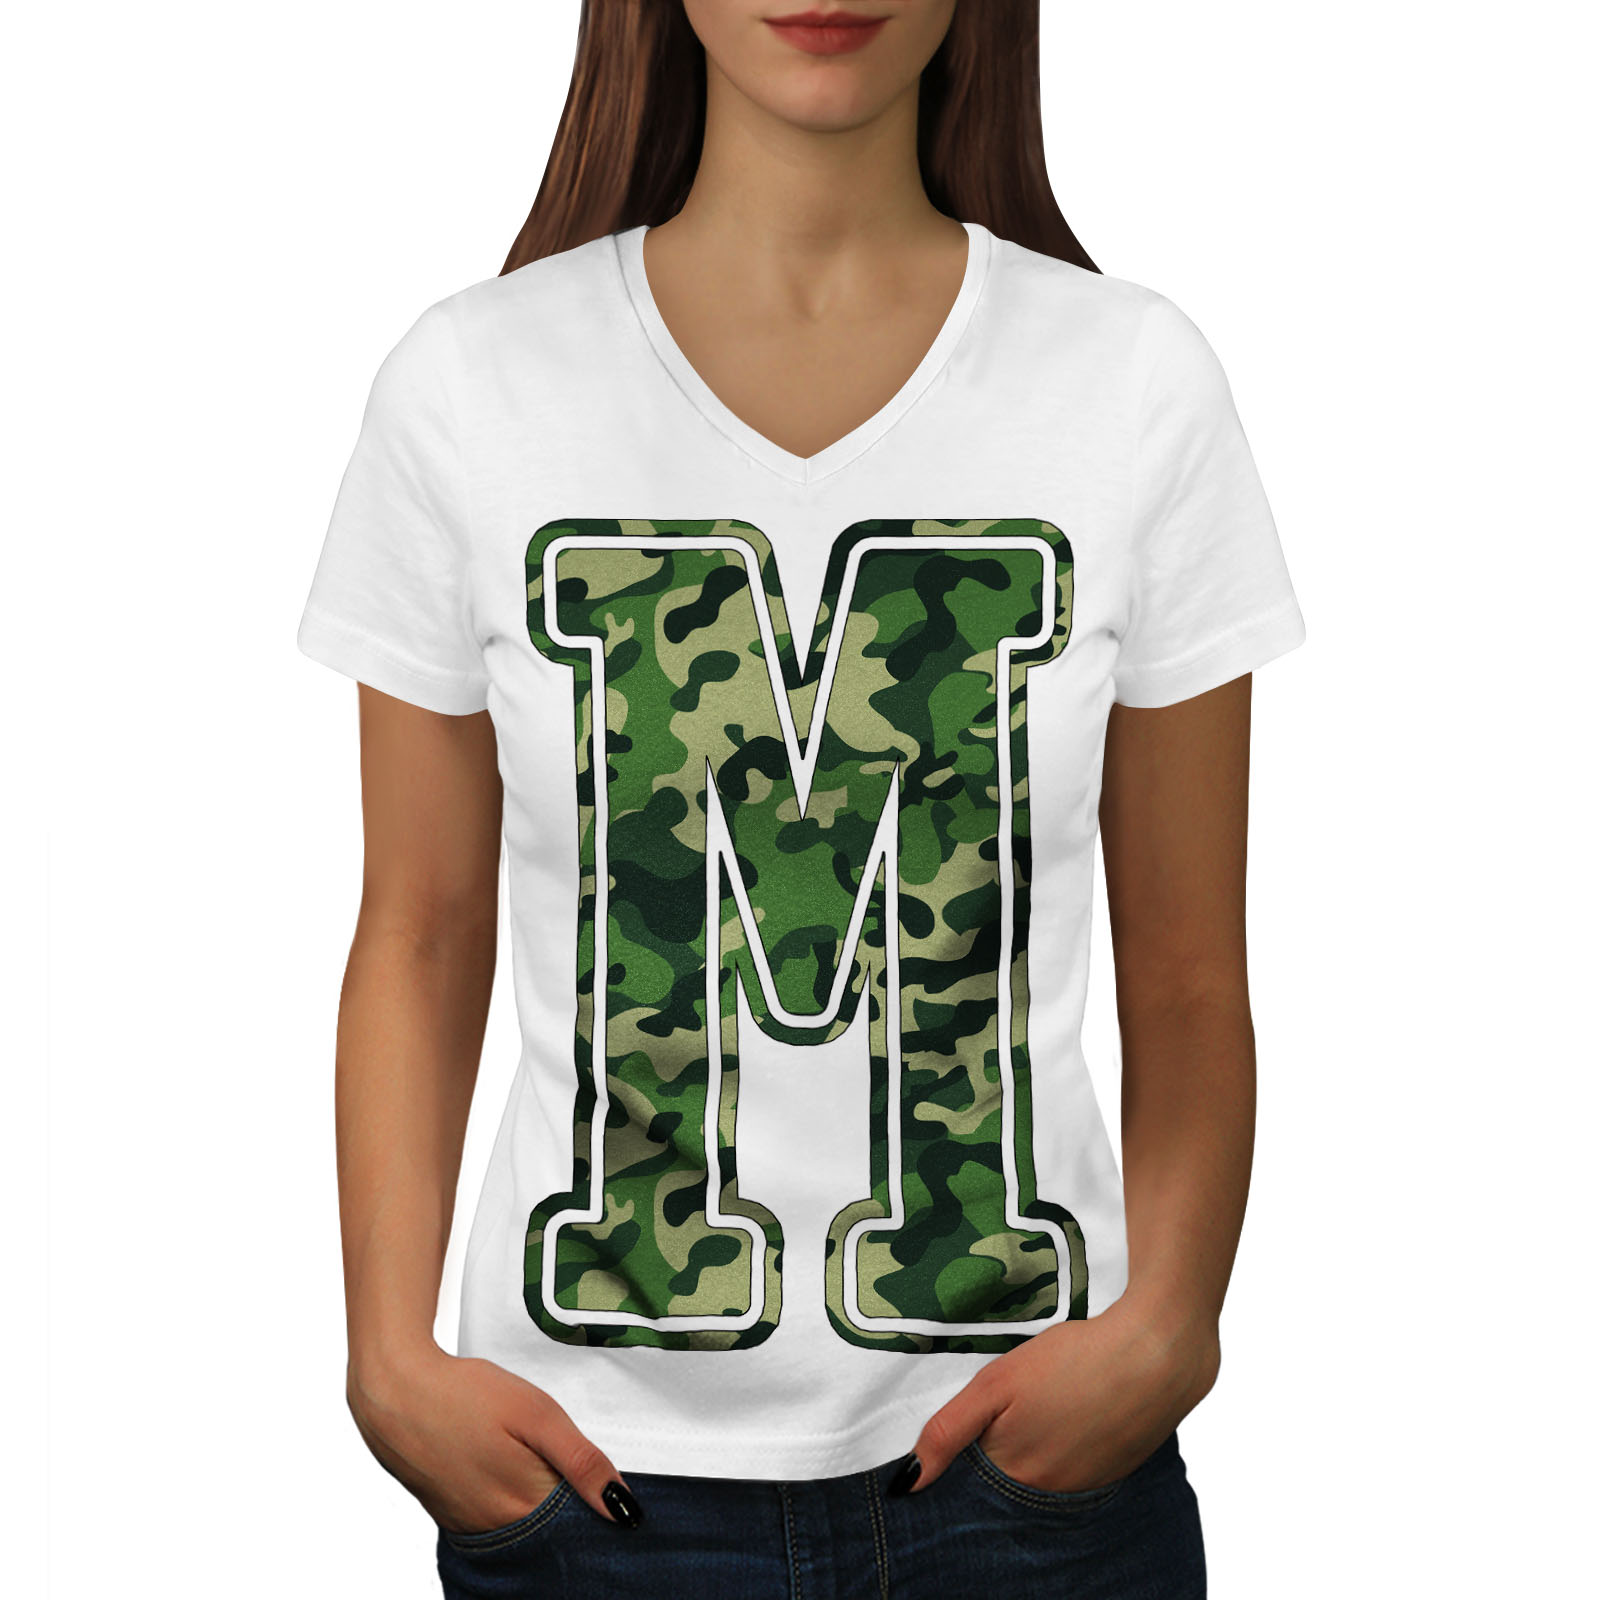 Wellcoda M for Millitary Womens V-Neck T-shirt, Camouflage G